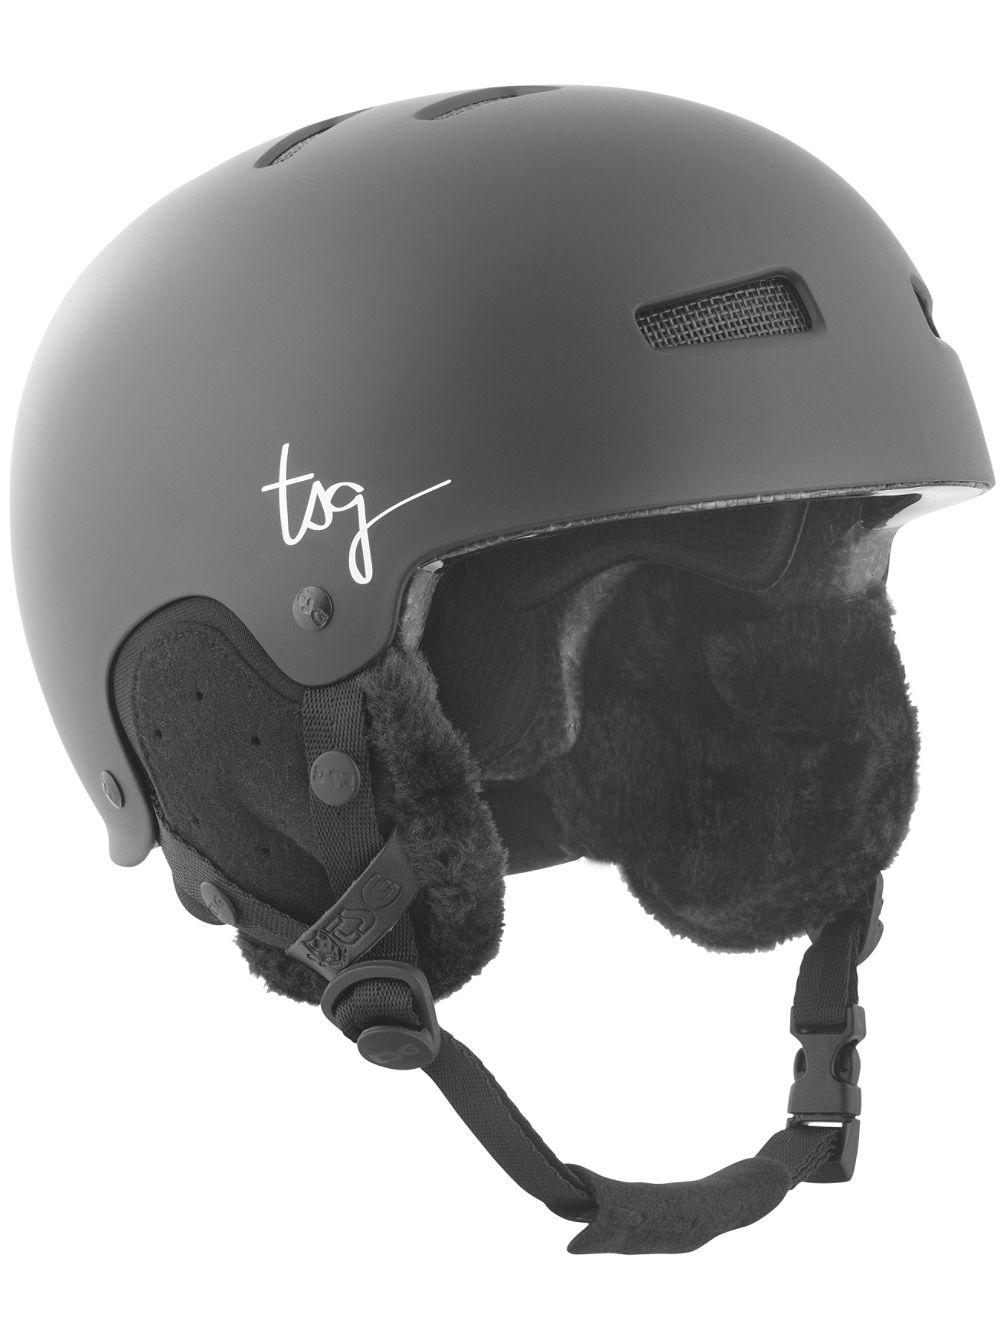 tsg-lotus-solid-color-helmet